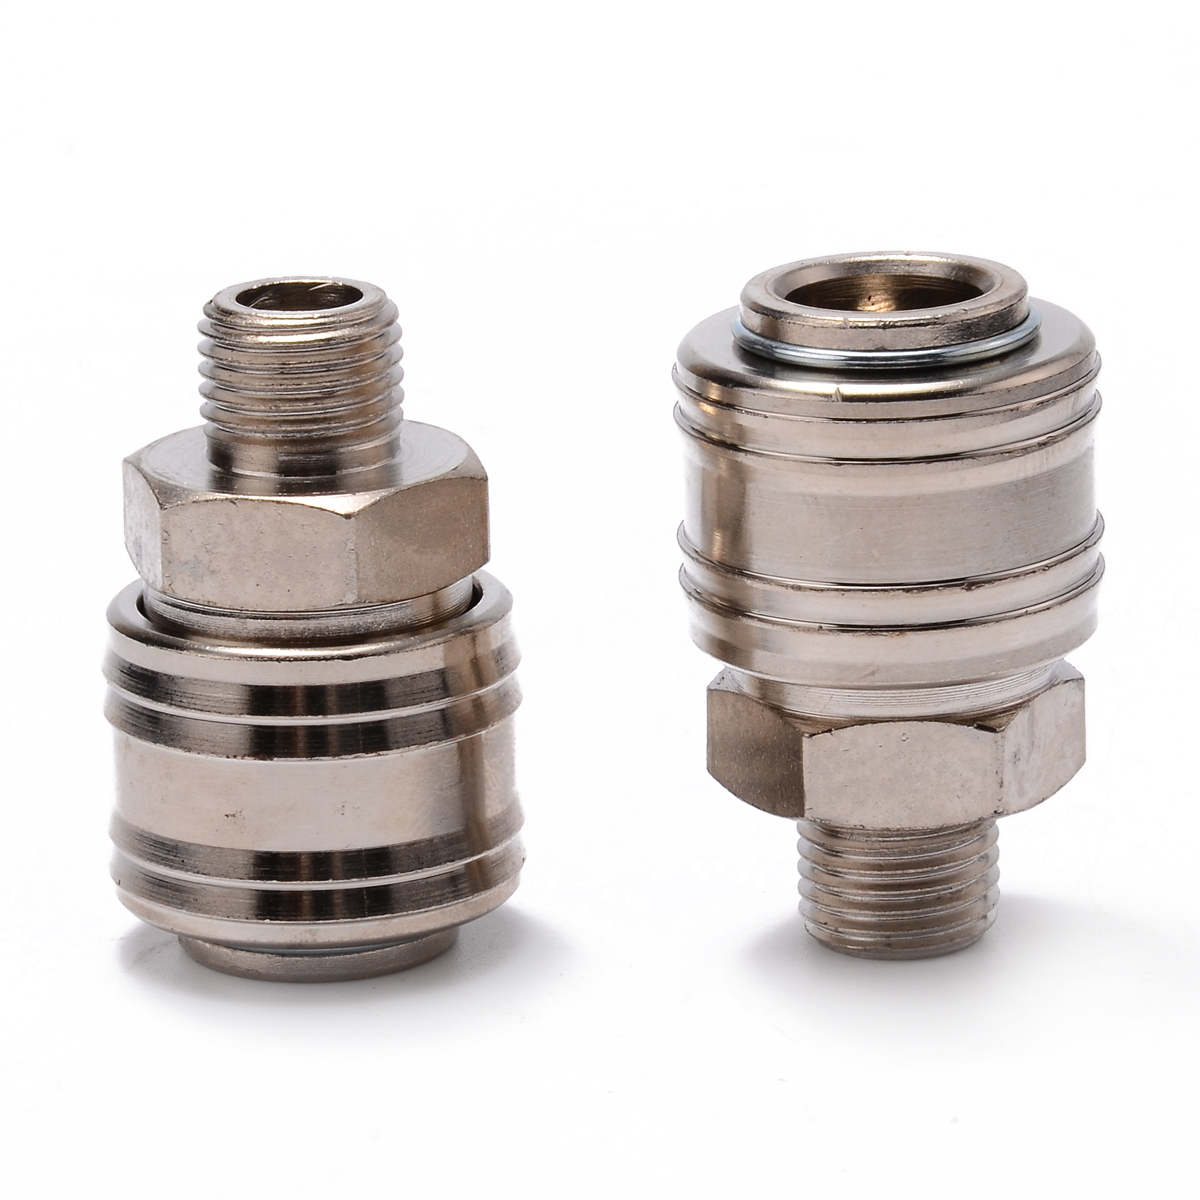 10Pcs Compressor Quick Release Coupler Connector Air Line Hose Adapter PF20